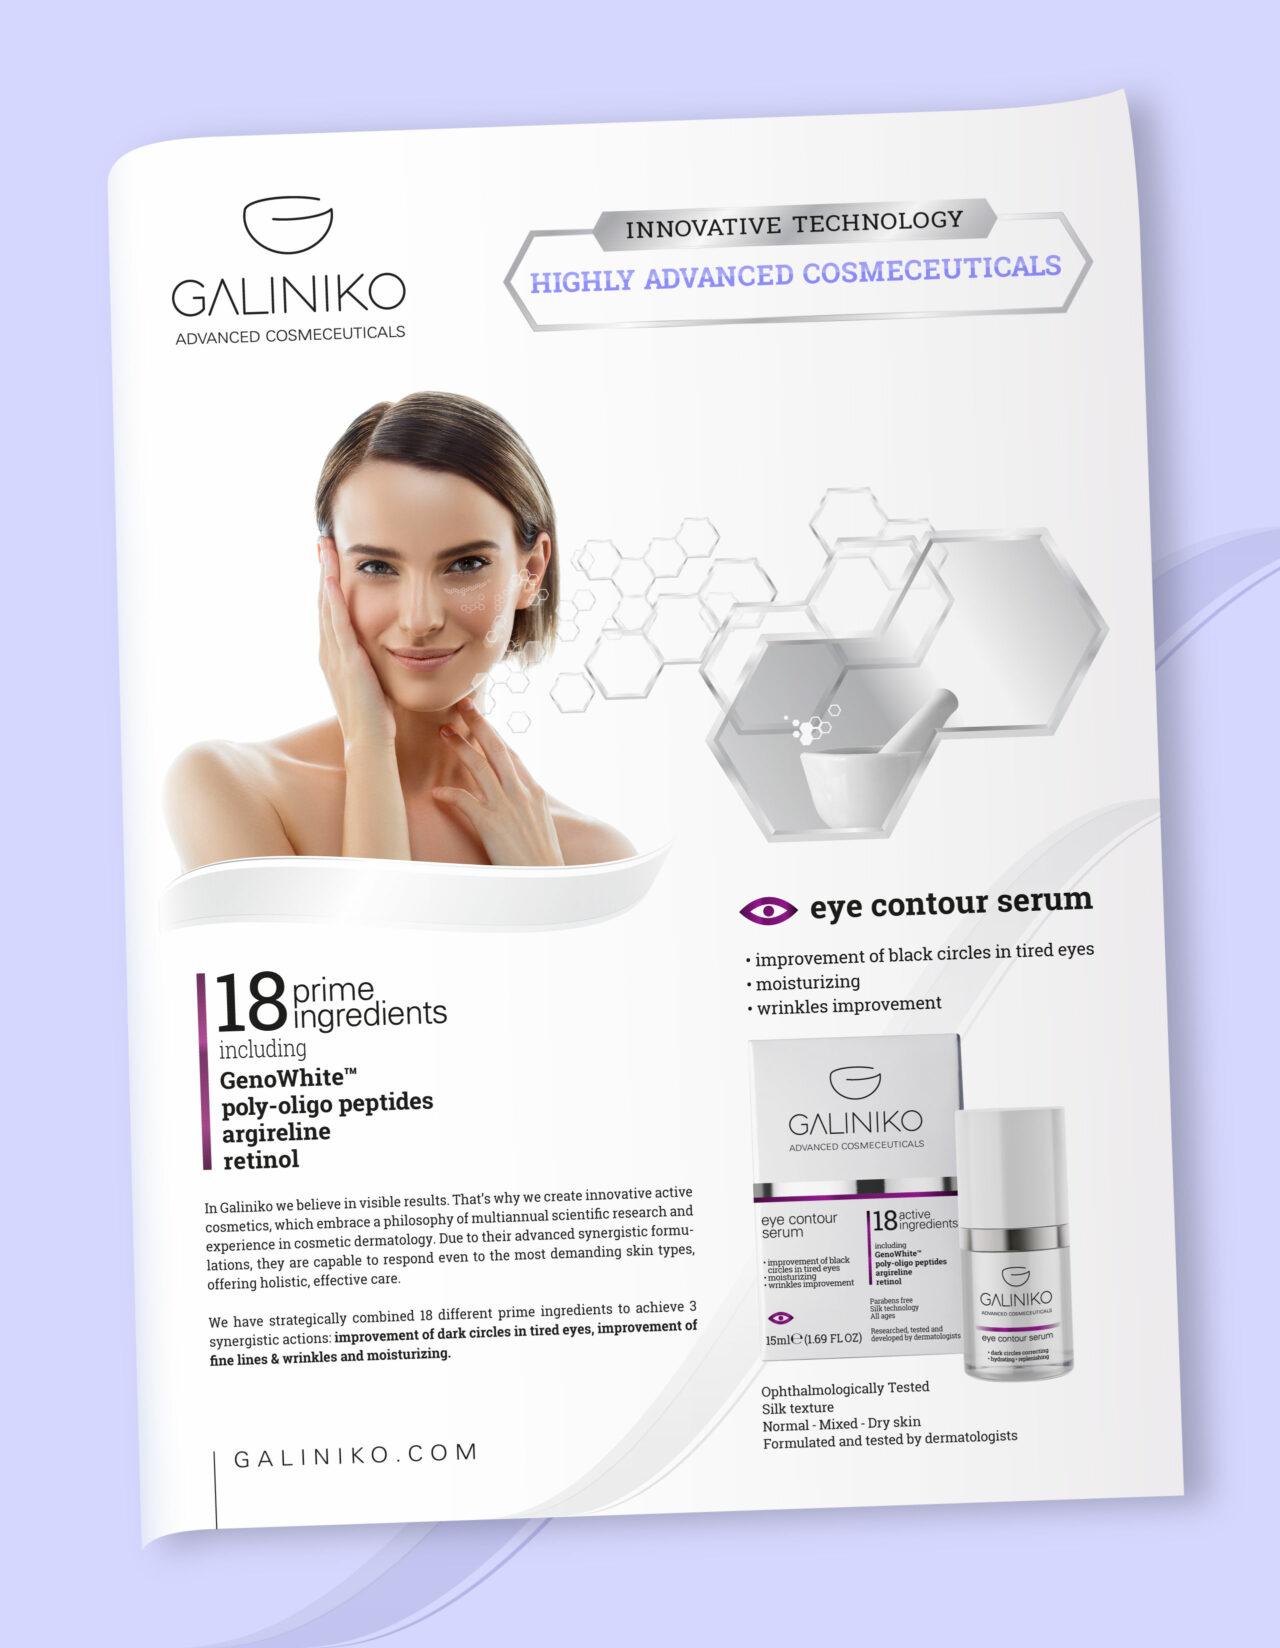 Eye contour serum print ad design for Galiniko skincare products